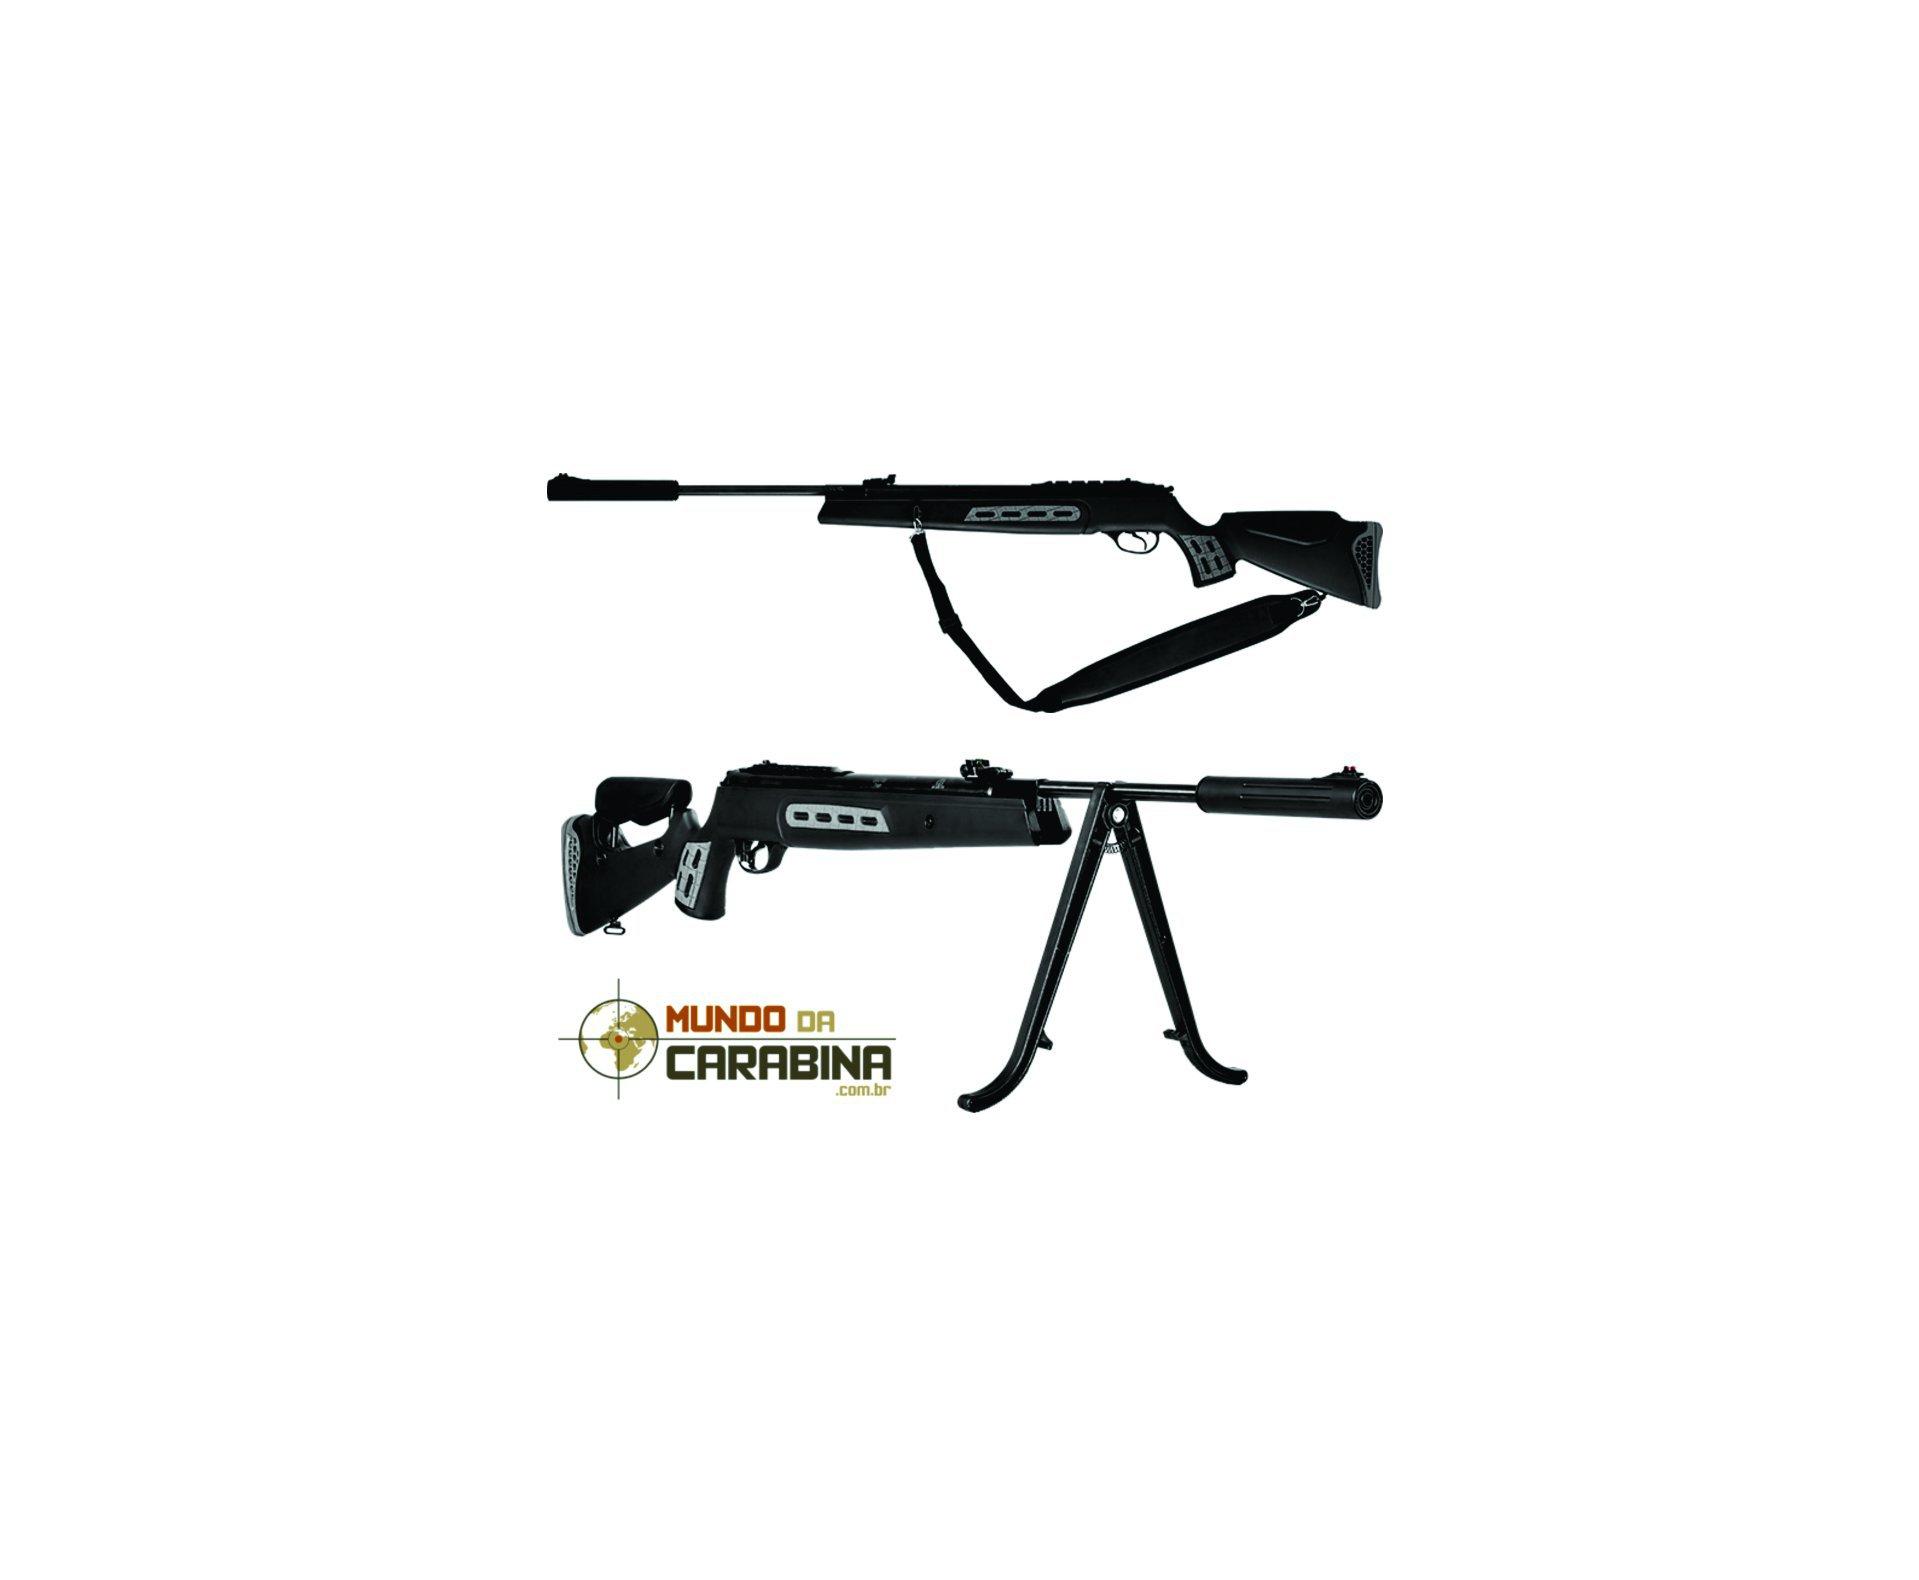 Carabina De Pressão Hatsan Ht 125 Sniper - Calibre 5,5 Mm - Sistema Sas